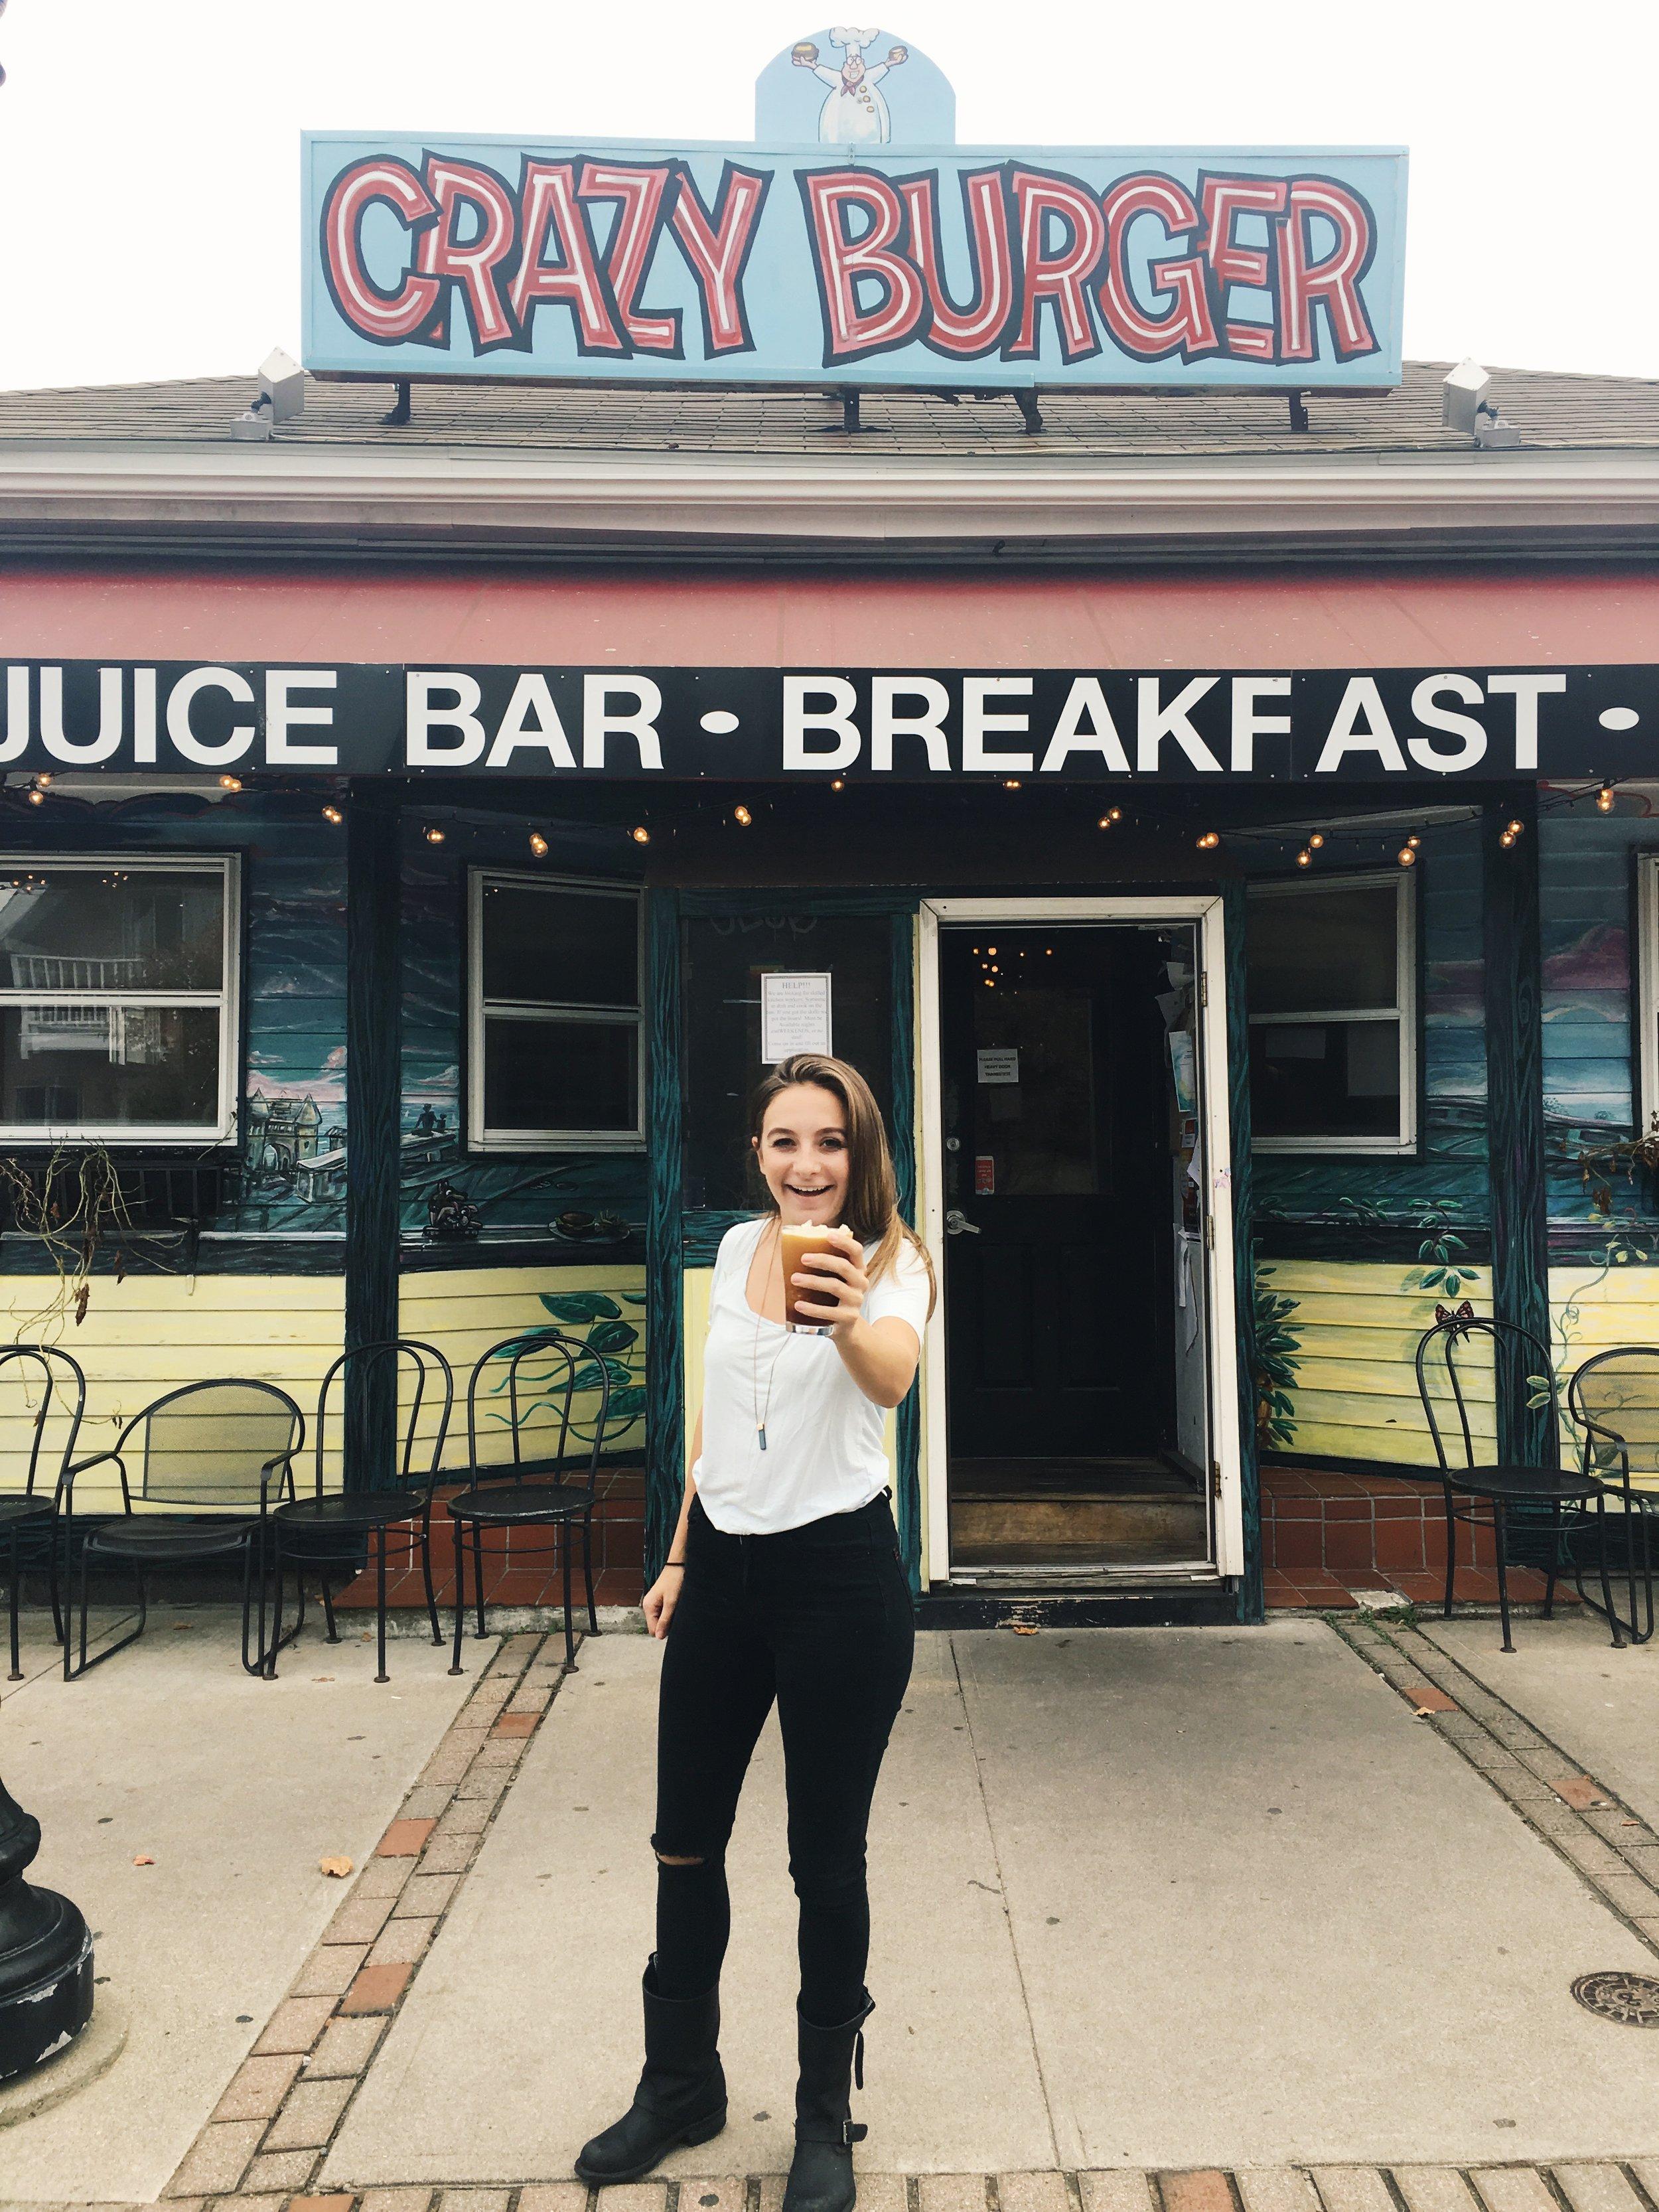 Crazy Burger, Narragansett, RI